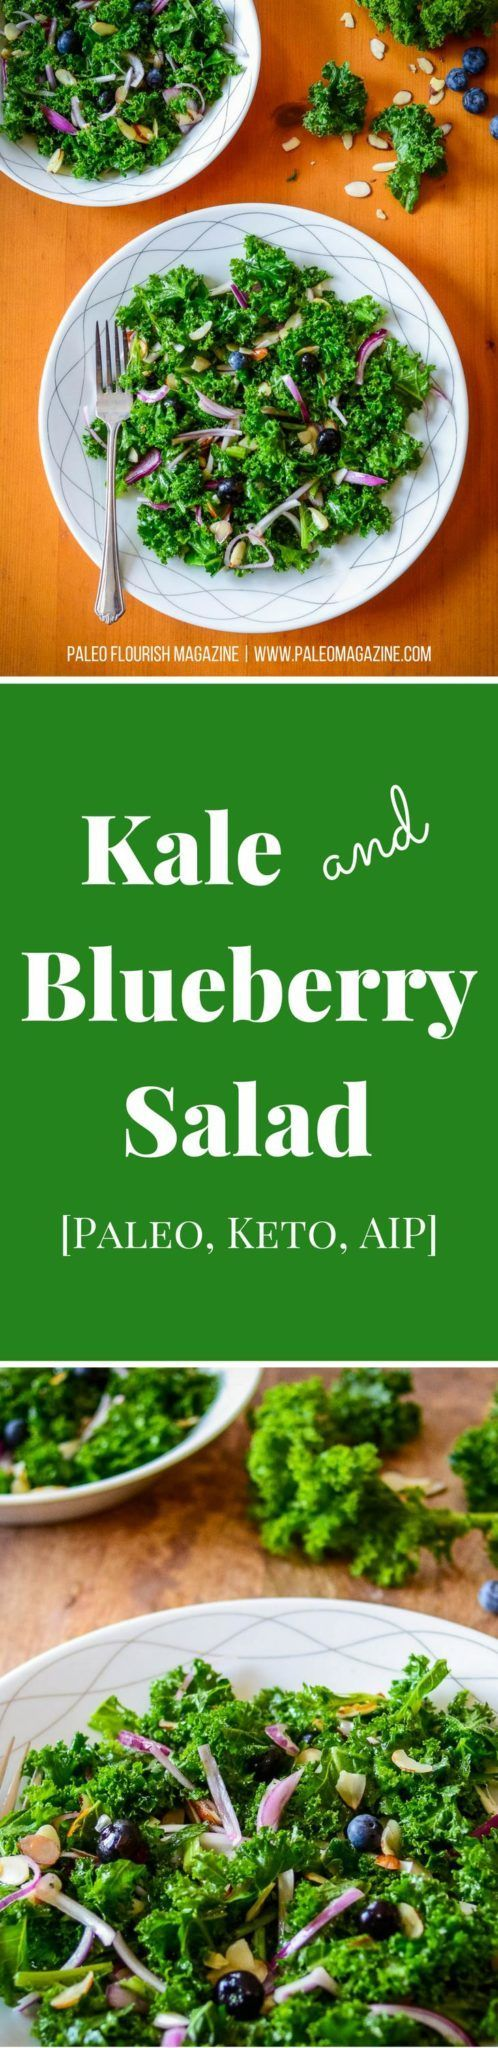 Kale and Blueberry Salad Recipe [Paleo, Keto, AIP] #paleo #keto #aip #recipes - https://paleomagazine.com/kale-blueberry-salad-recipe-paleo-keto-aip